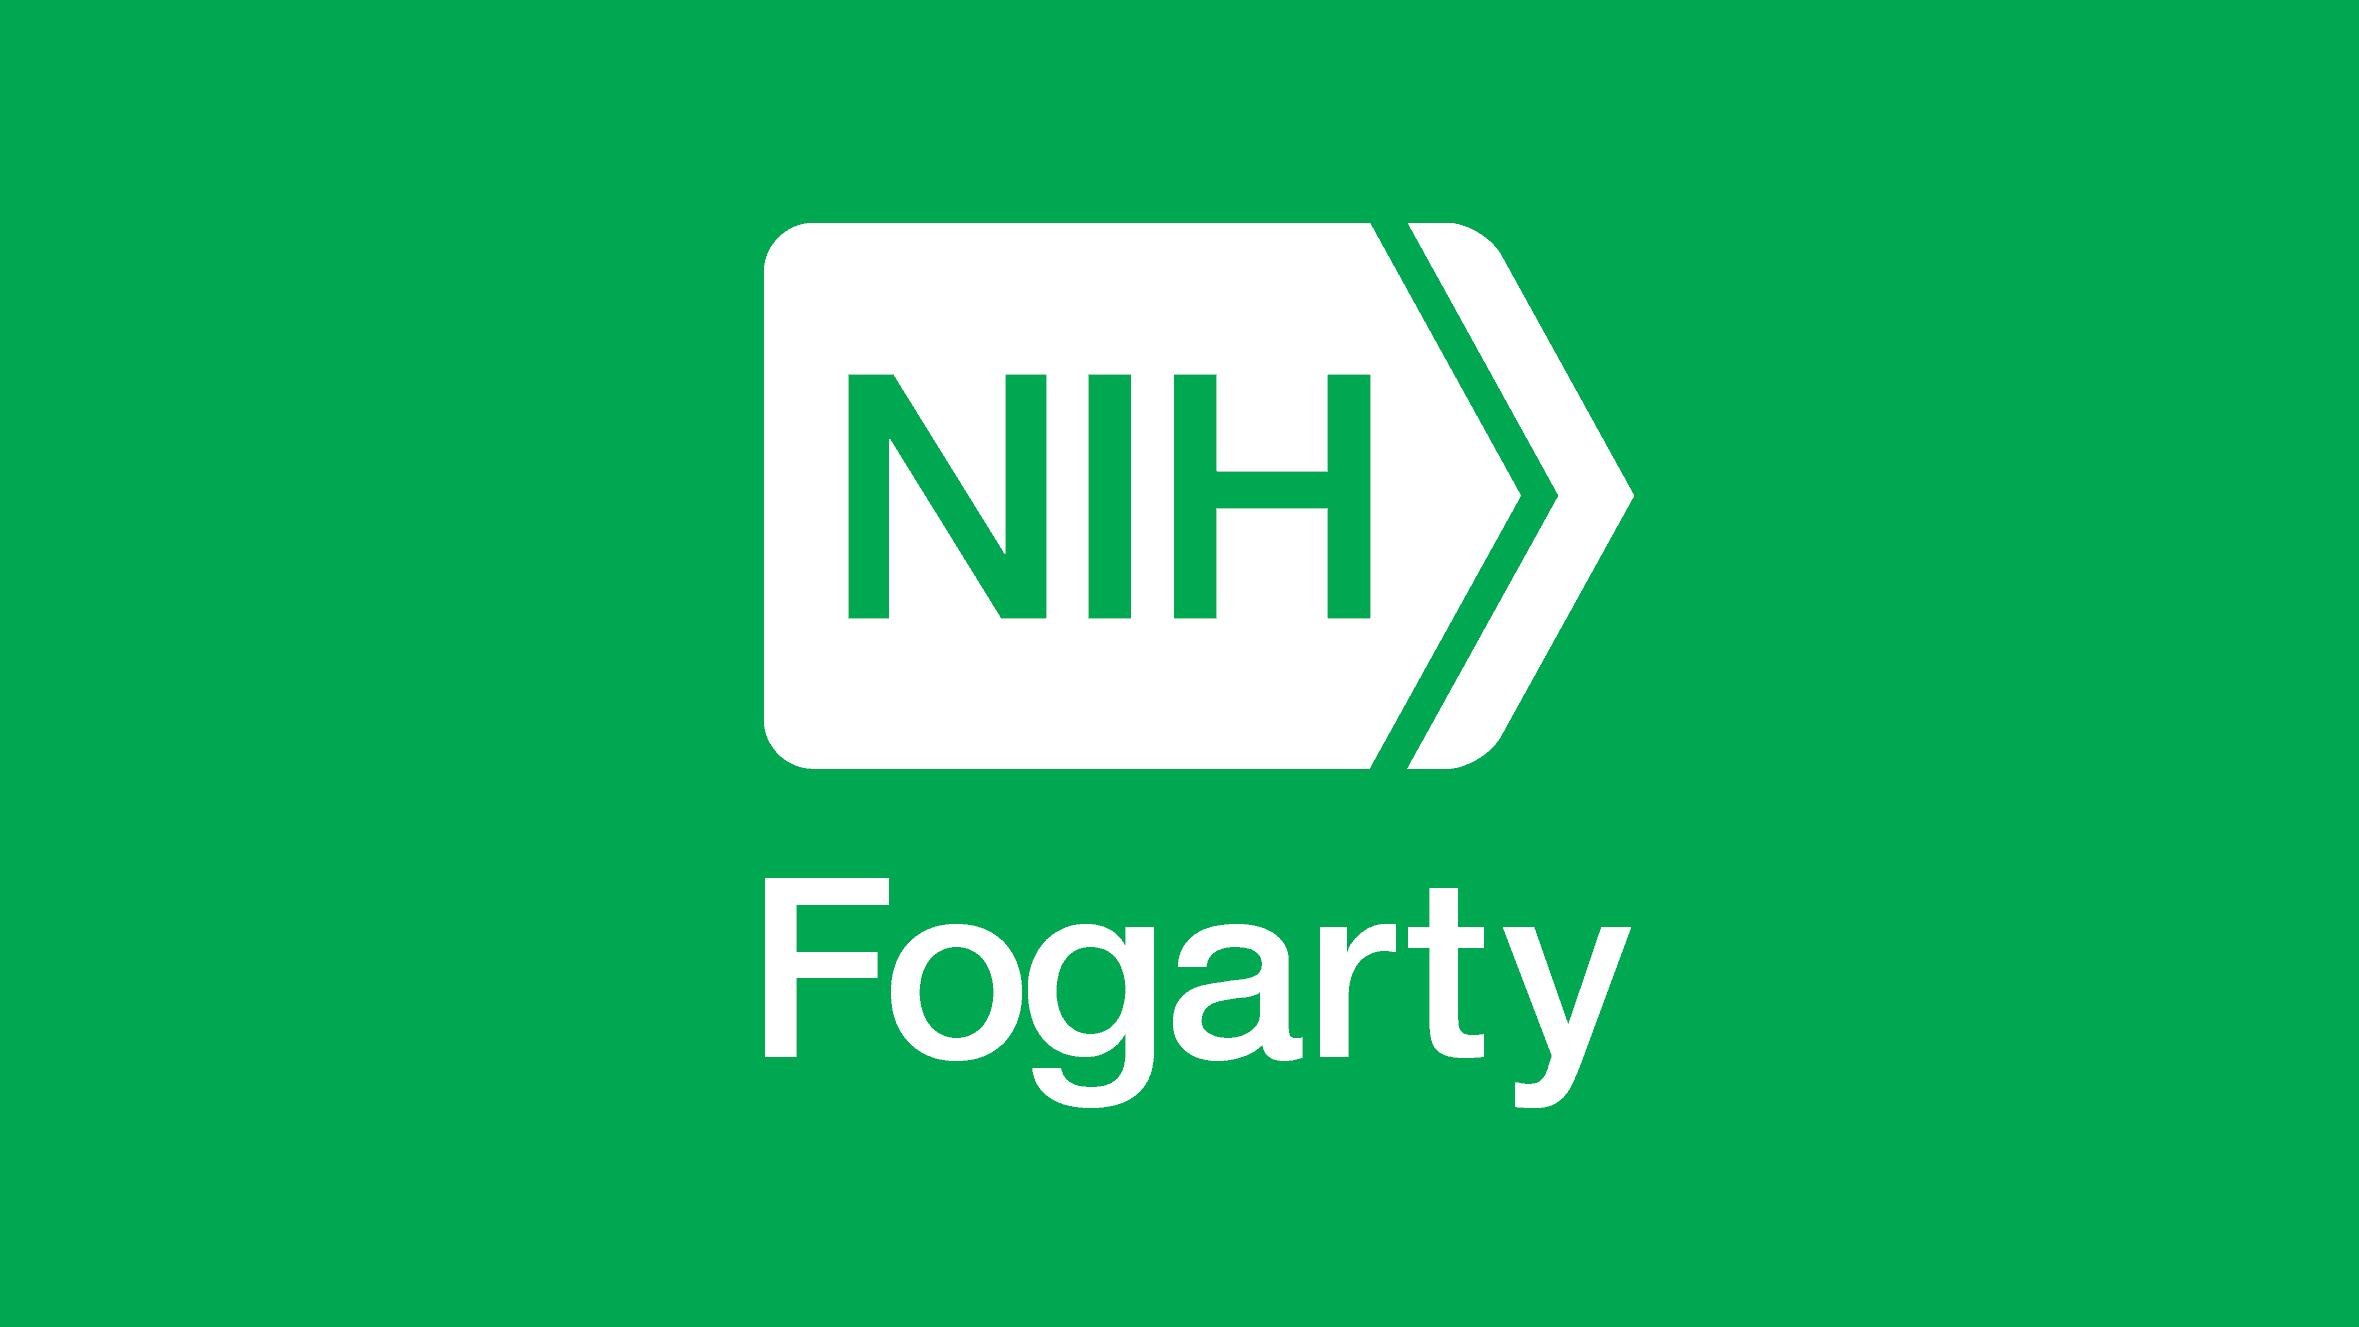 NIH Fogarty